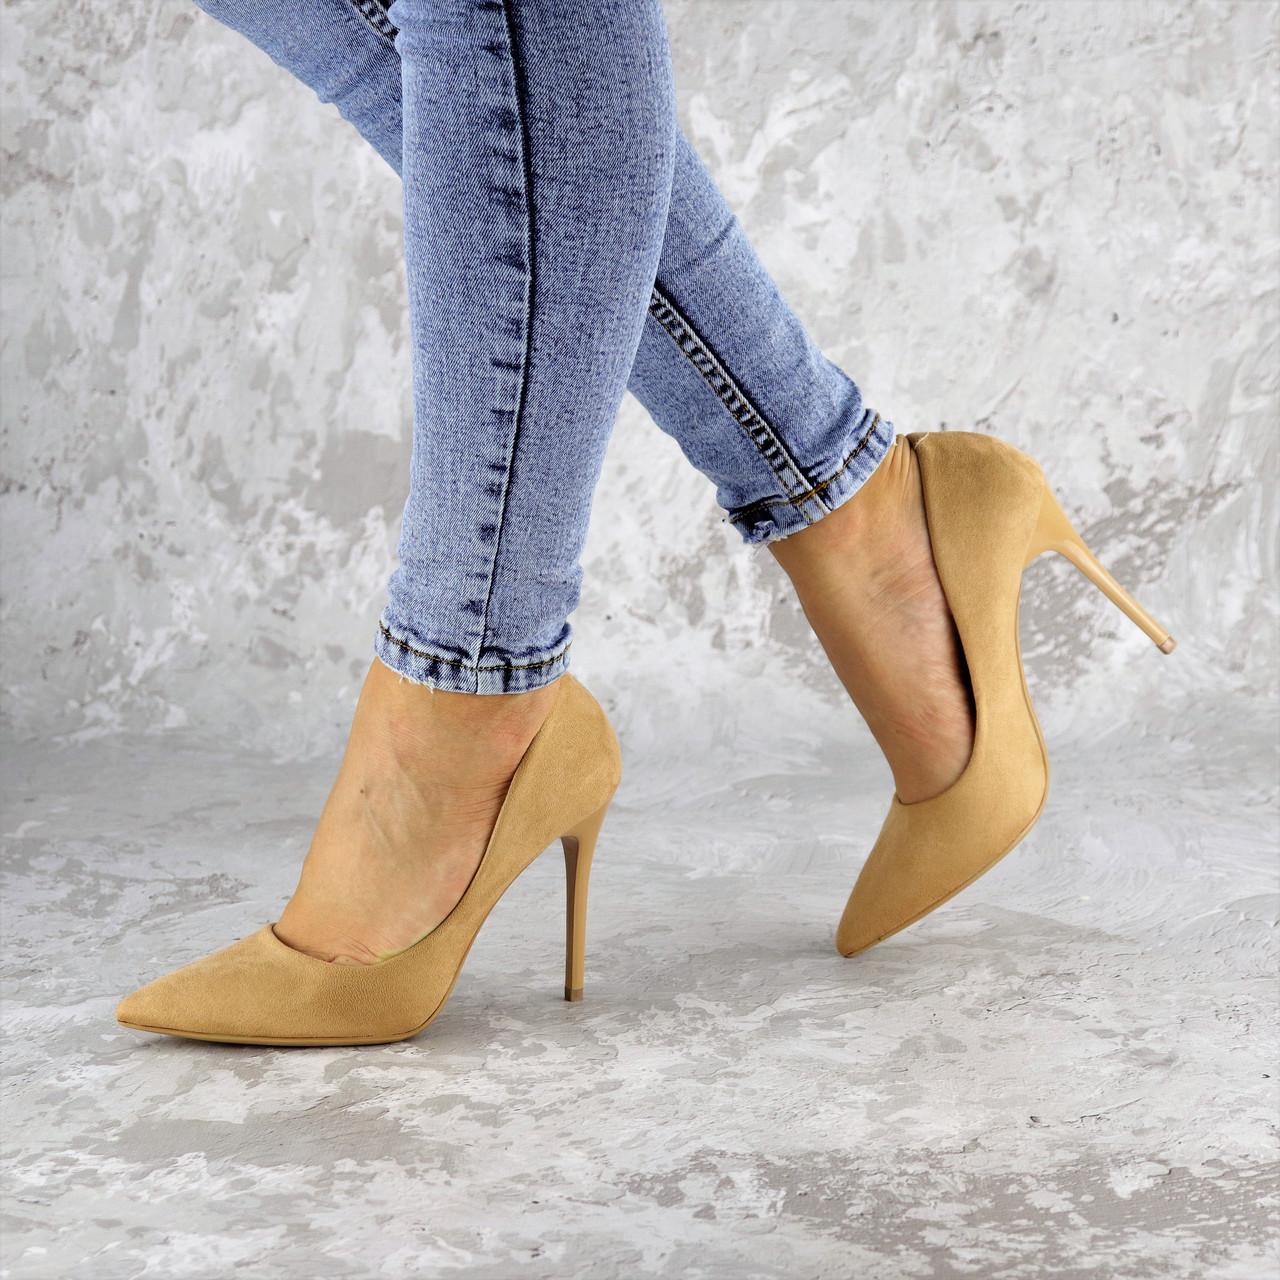 Туфли женские на каблуке Fashion Gram 2262 36 размер 23 см Бежевый